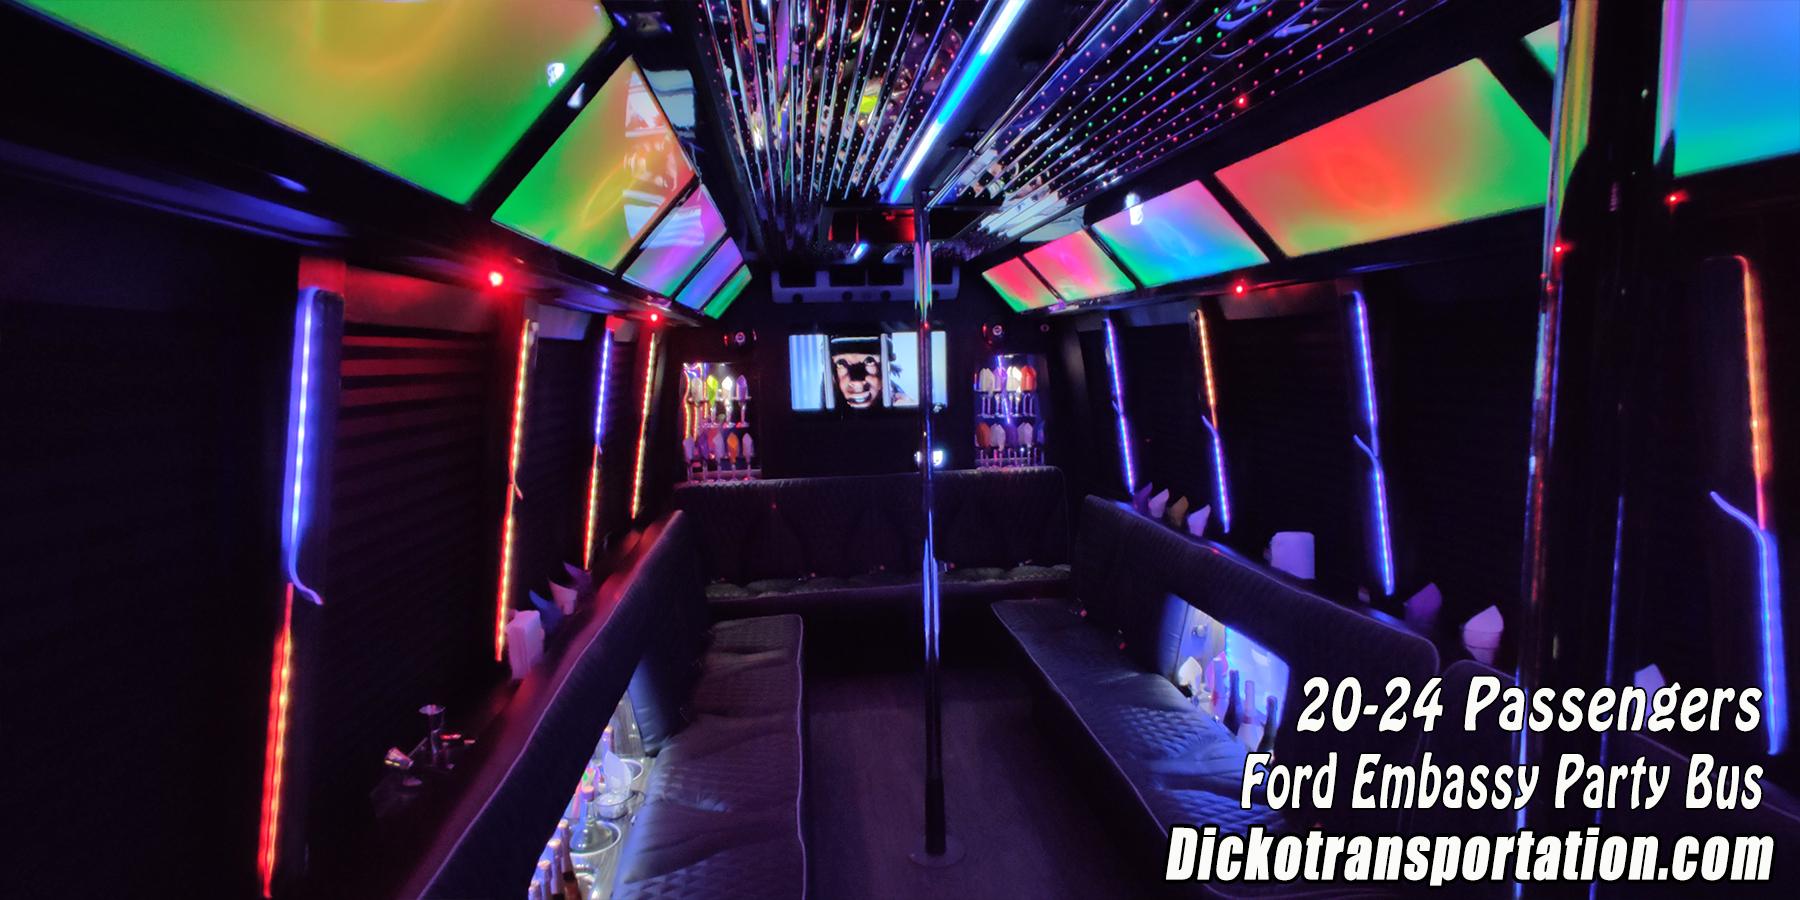 Dicko Transportation 24 Passenger Party Bus